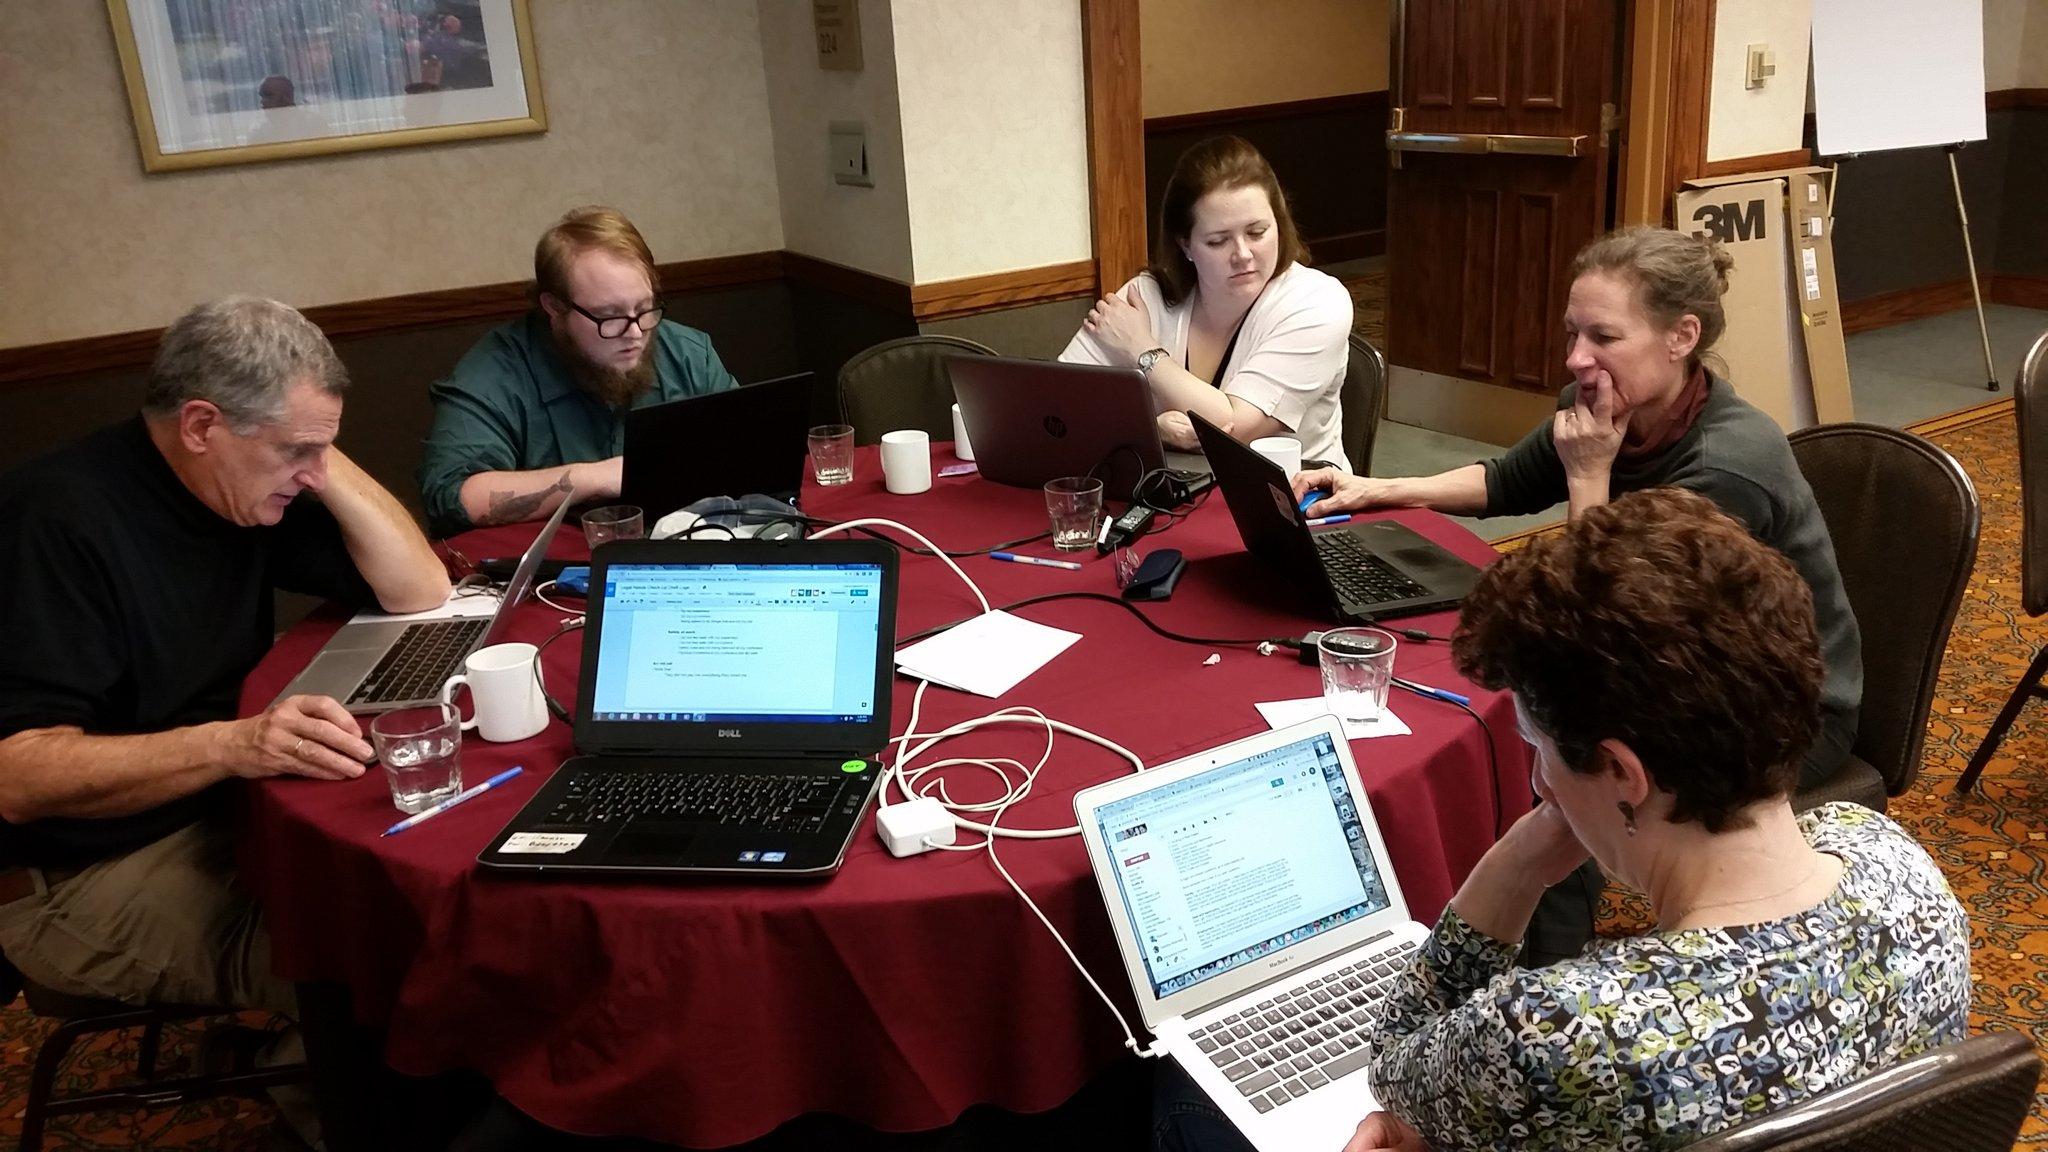 Legal check up working group at #LSCTIG Drupal #Hackathon getting it done! @A2JAuthor @PineTreeLegal @ILAO @MassLS @MassLegalHelp https://t.co/6skUFvVsku